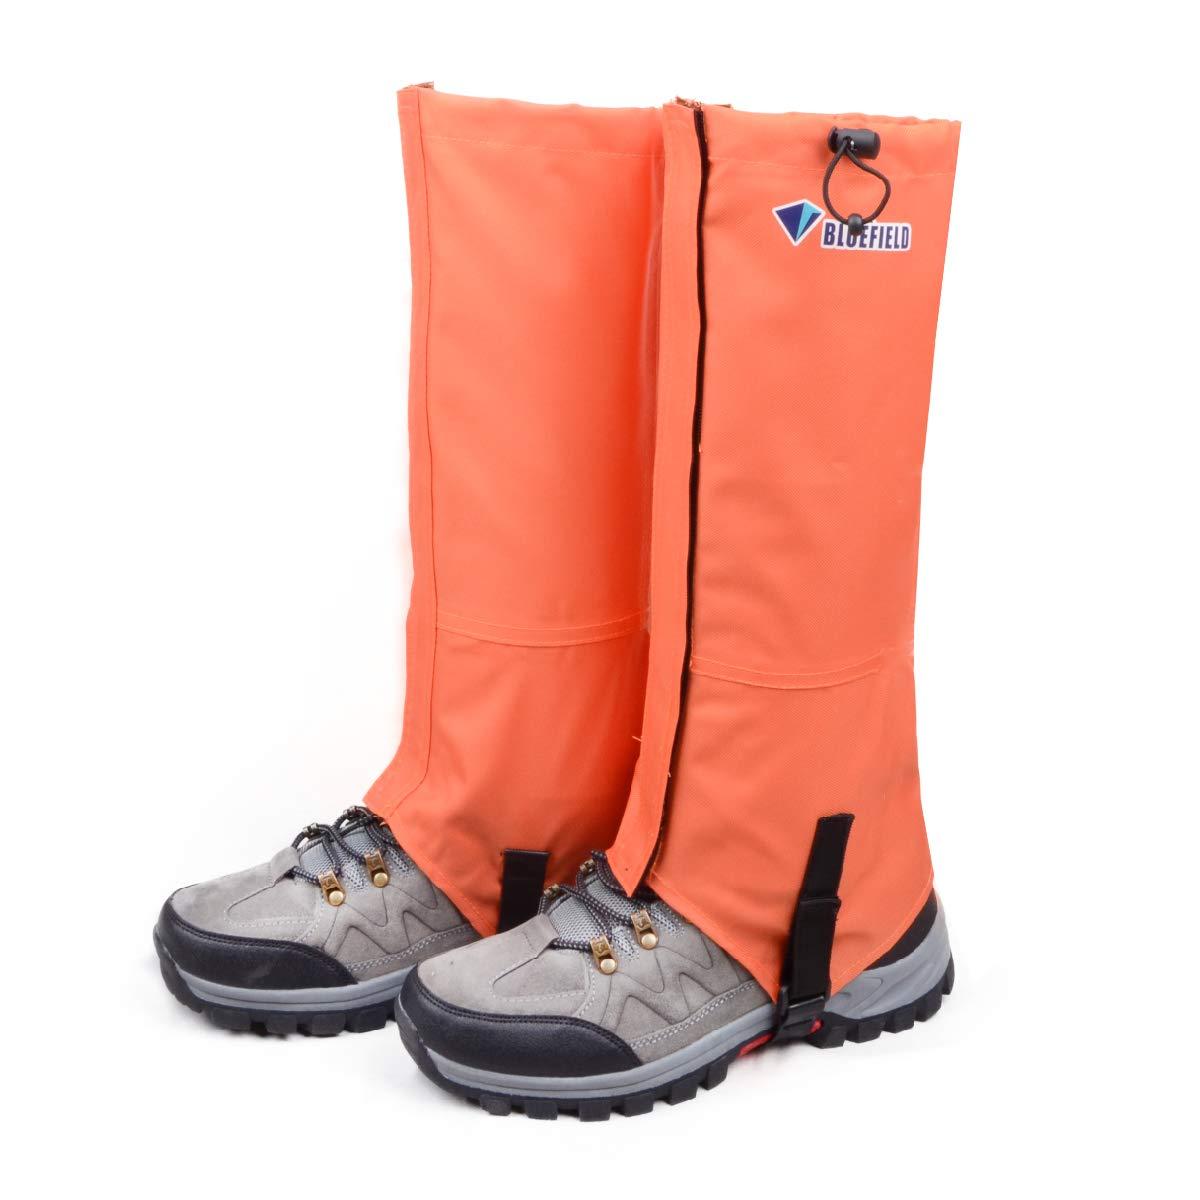 TRIWONDER Leg Gaiters Waterproof Snow Boot Gators Hiking Gaiters Men Women for Walking Climbing Hunting Cycling Backpacking Lightweight Rain Shoe Gaiters (1 Pair) (Orange, S) by TRIWONDER